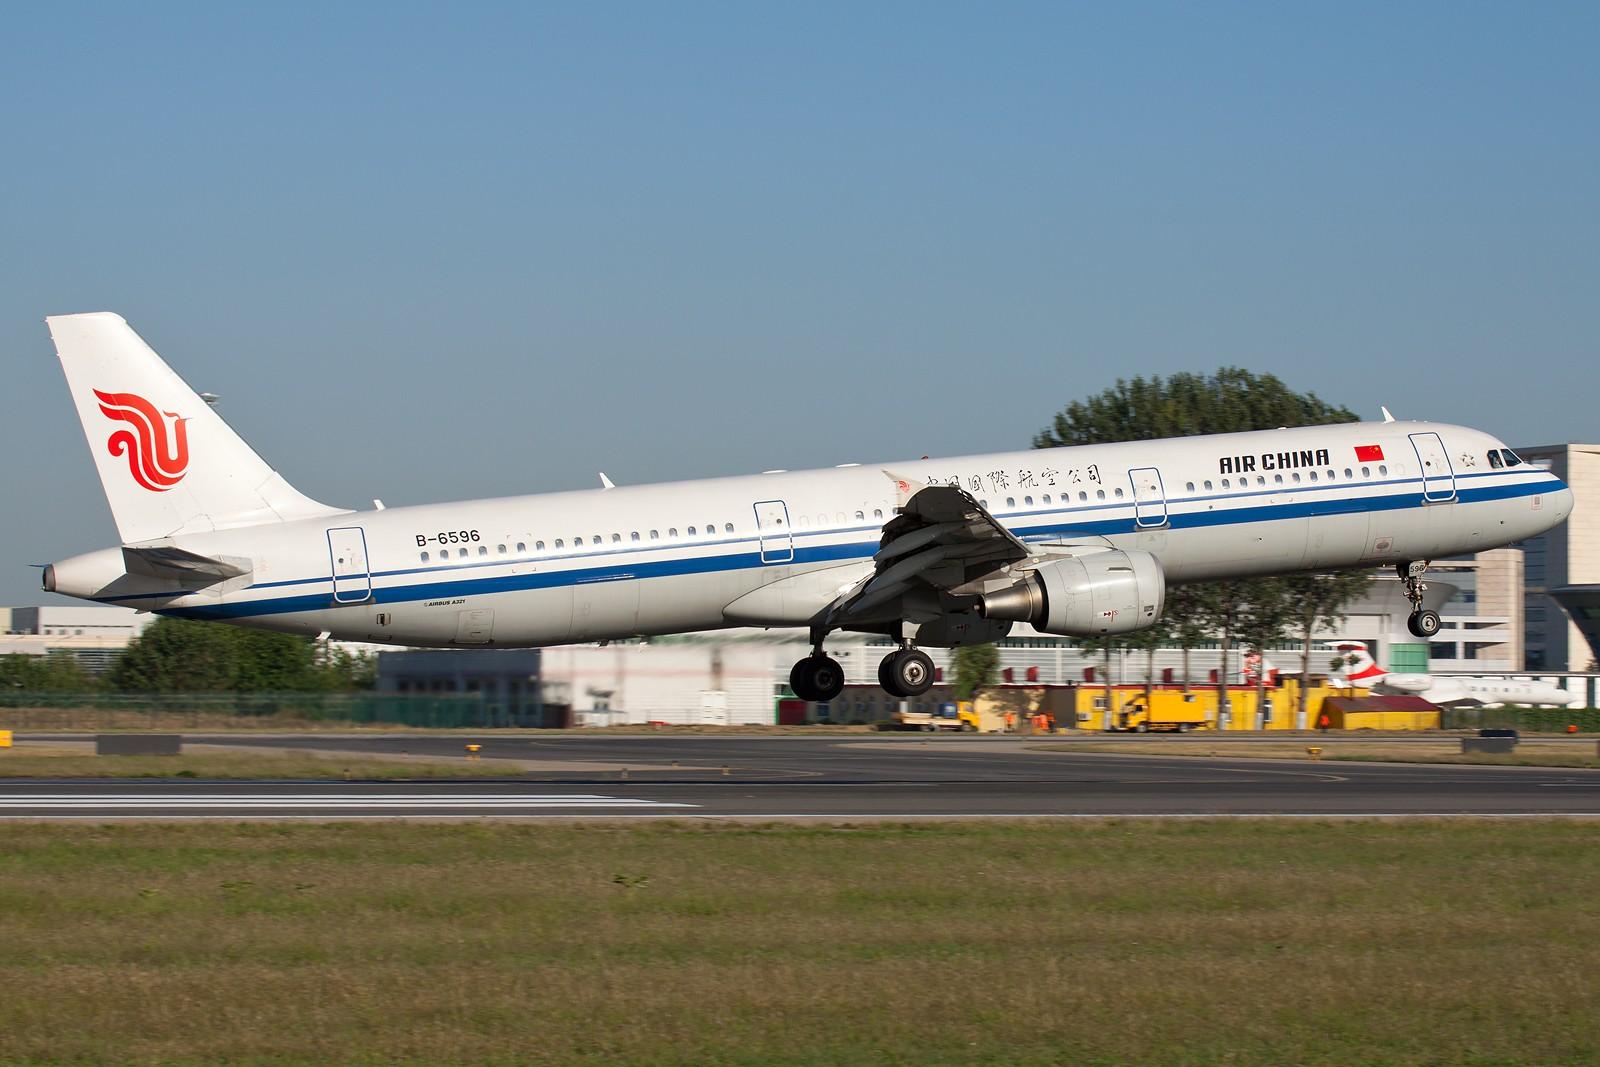 Re:[原创]国航一组 B737&A320系列 [10pics] AIRBUS A321-200 B-6596 中国北京首都机场